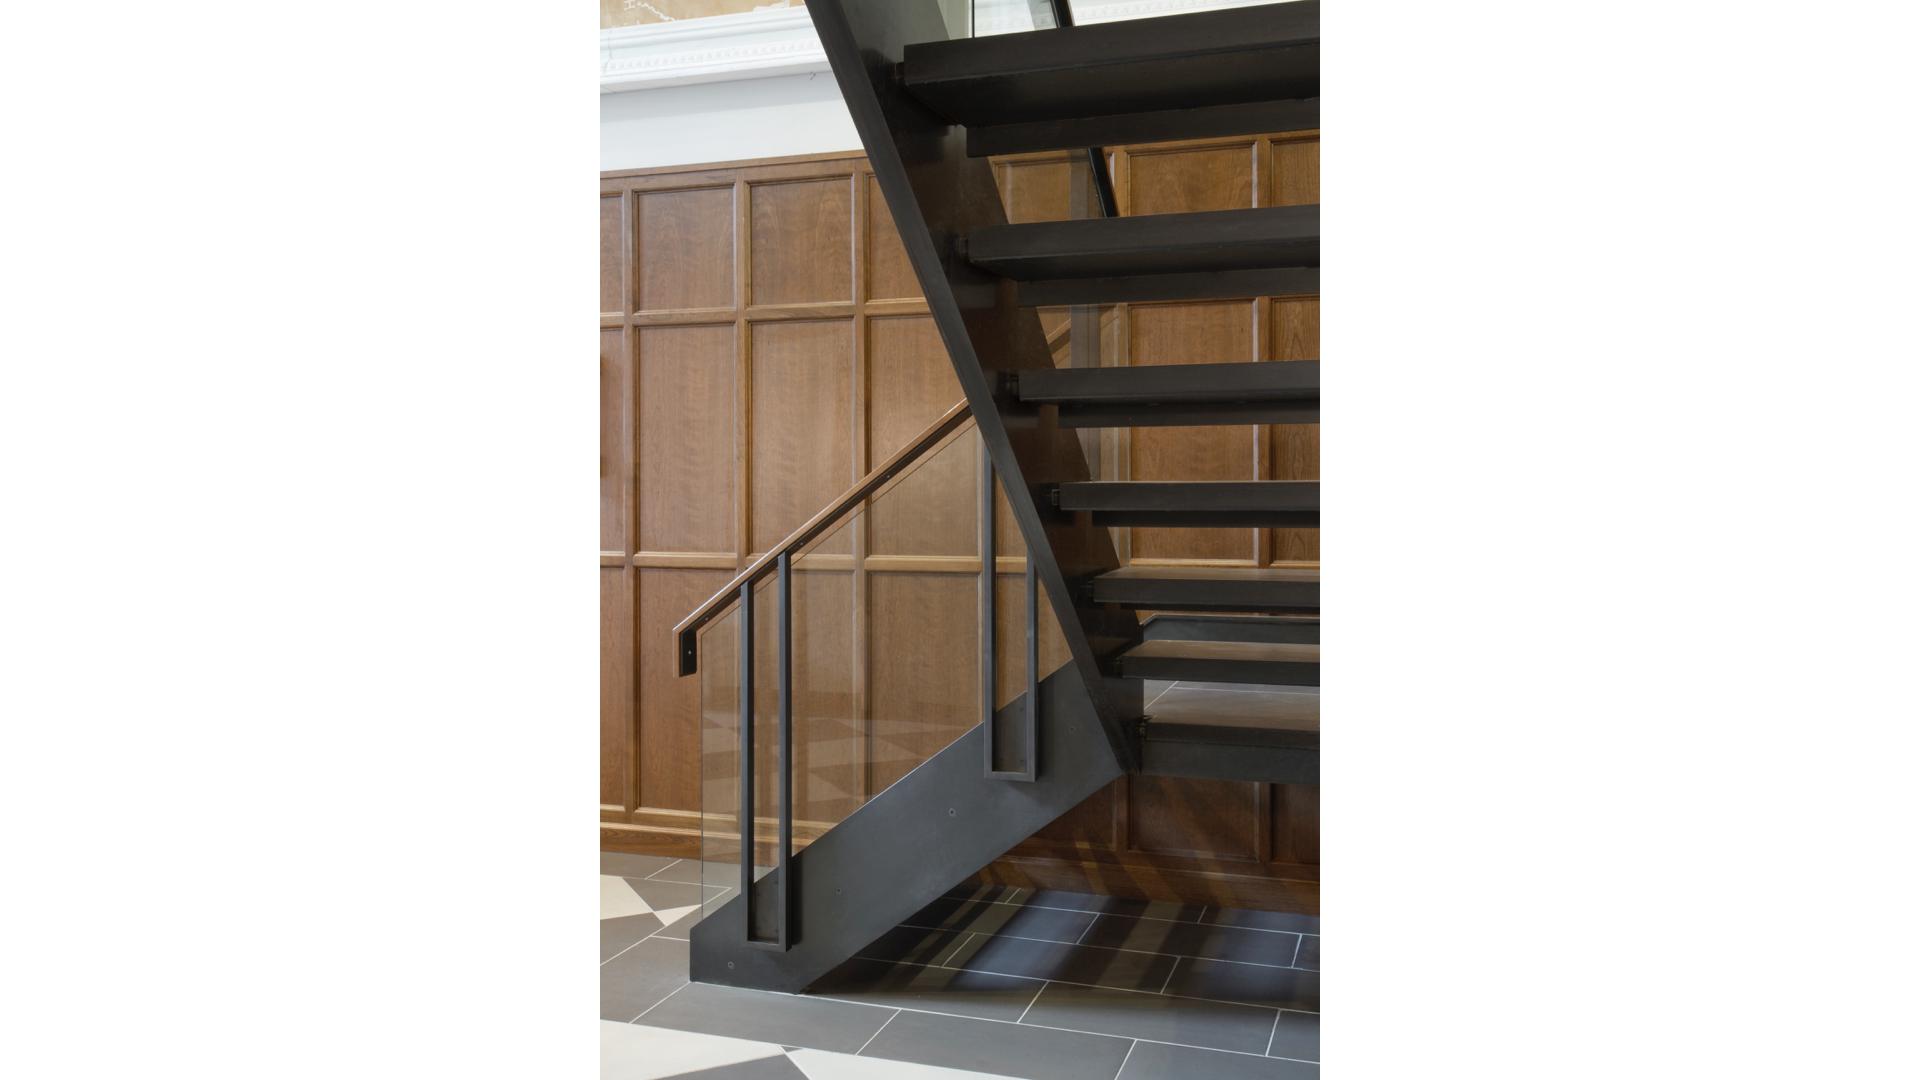 Steel and Glass Staircase iii | © Bernardo Guillermo Studio